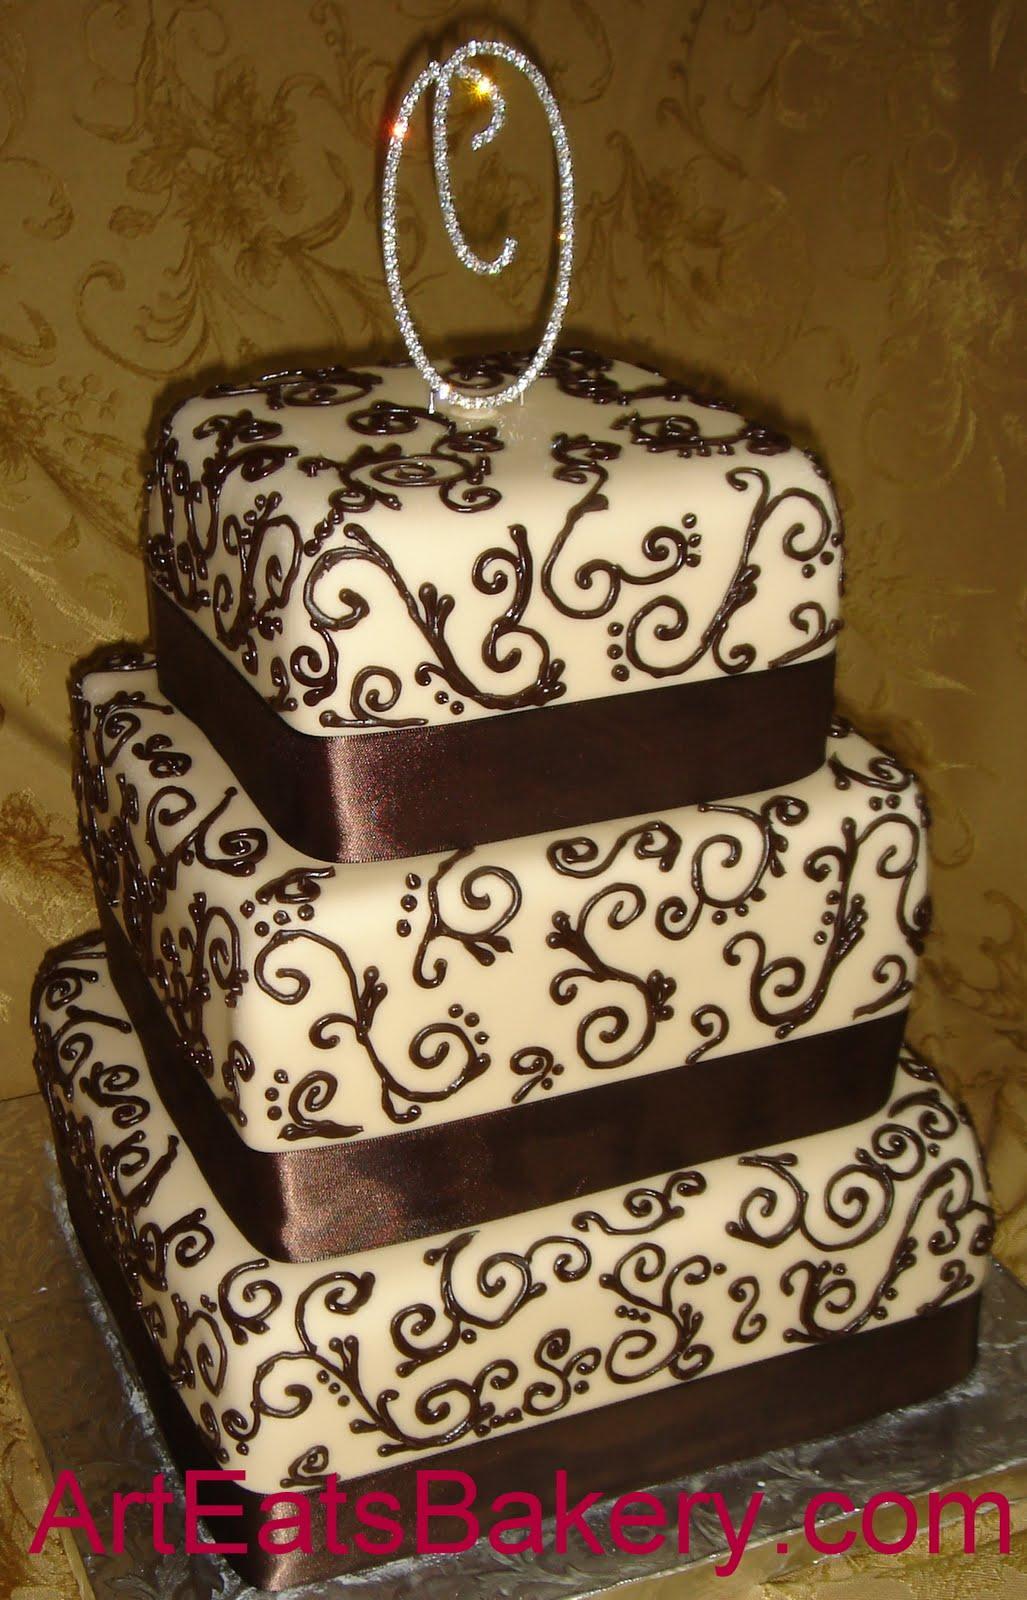 arteatsbakery Custom designed artistic cake pictures ...